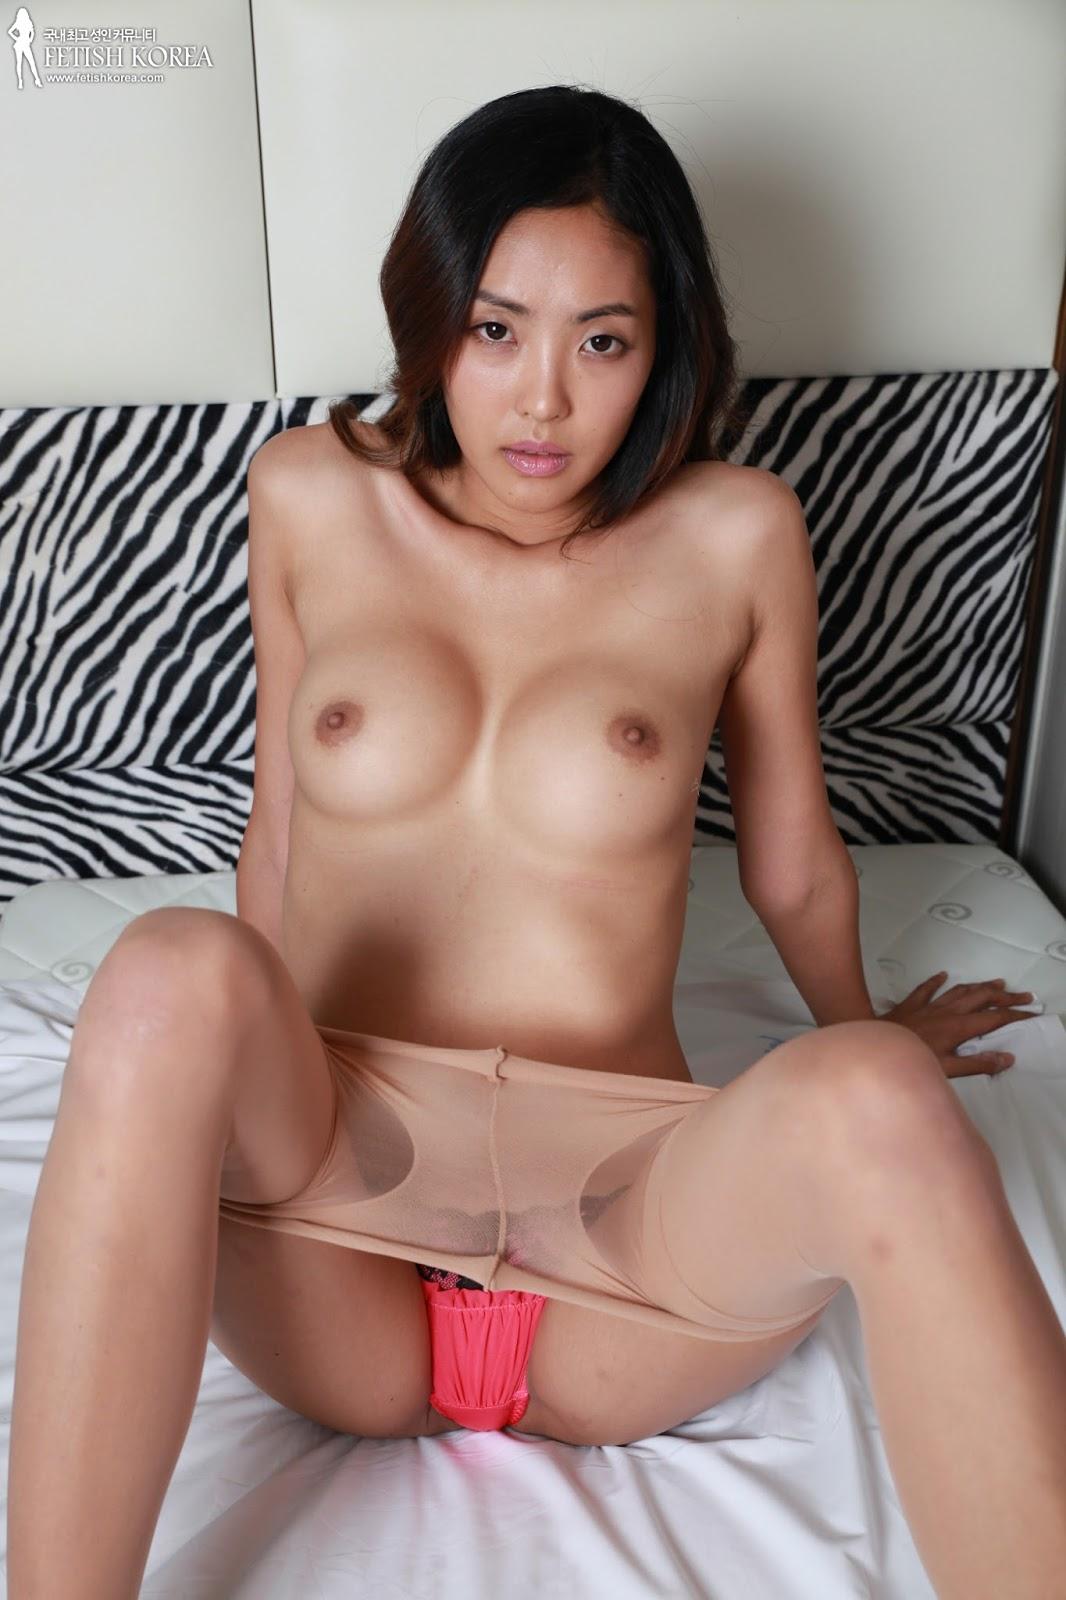 Korea big tits sweet darkhaired paisley 5